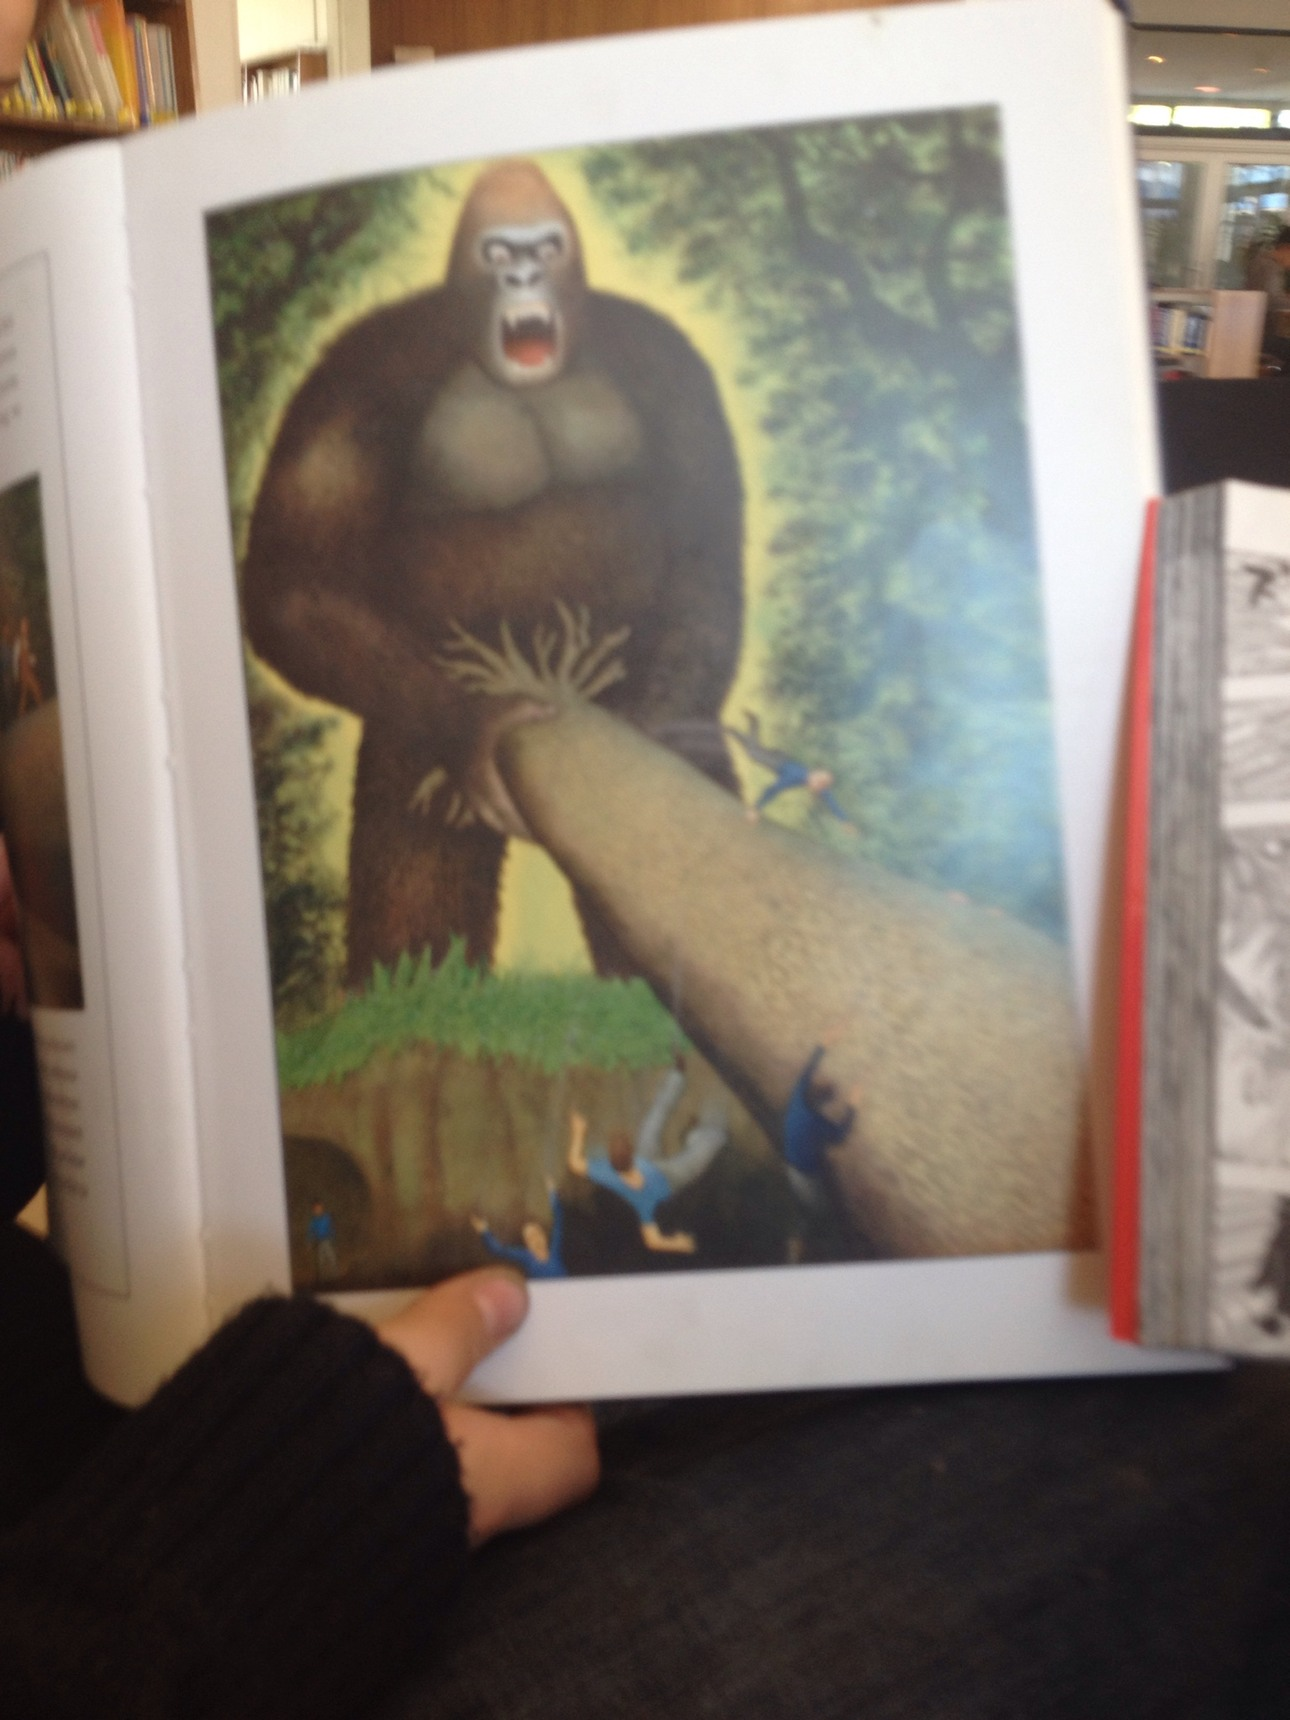 ese king Kong es un loquijo - meme